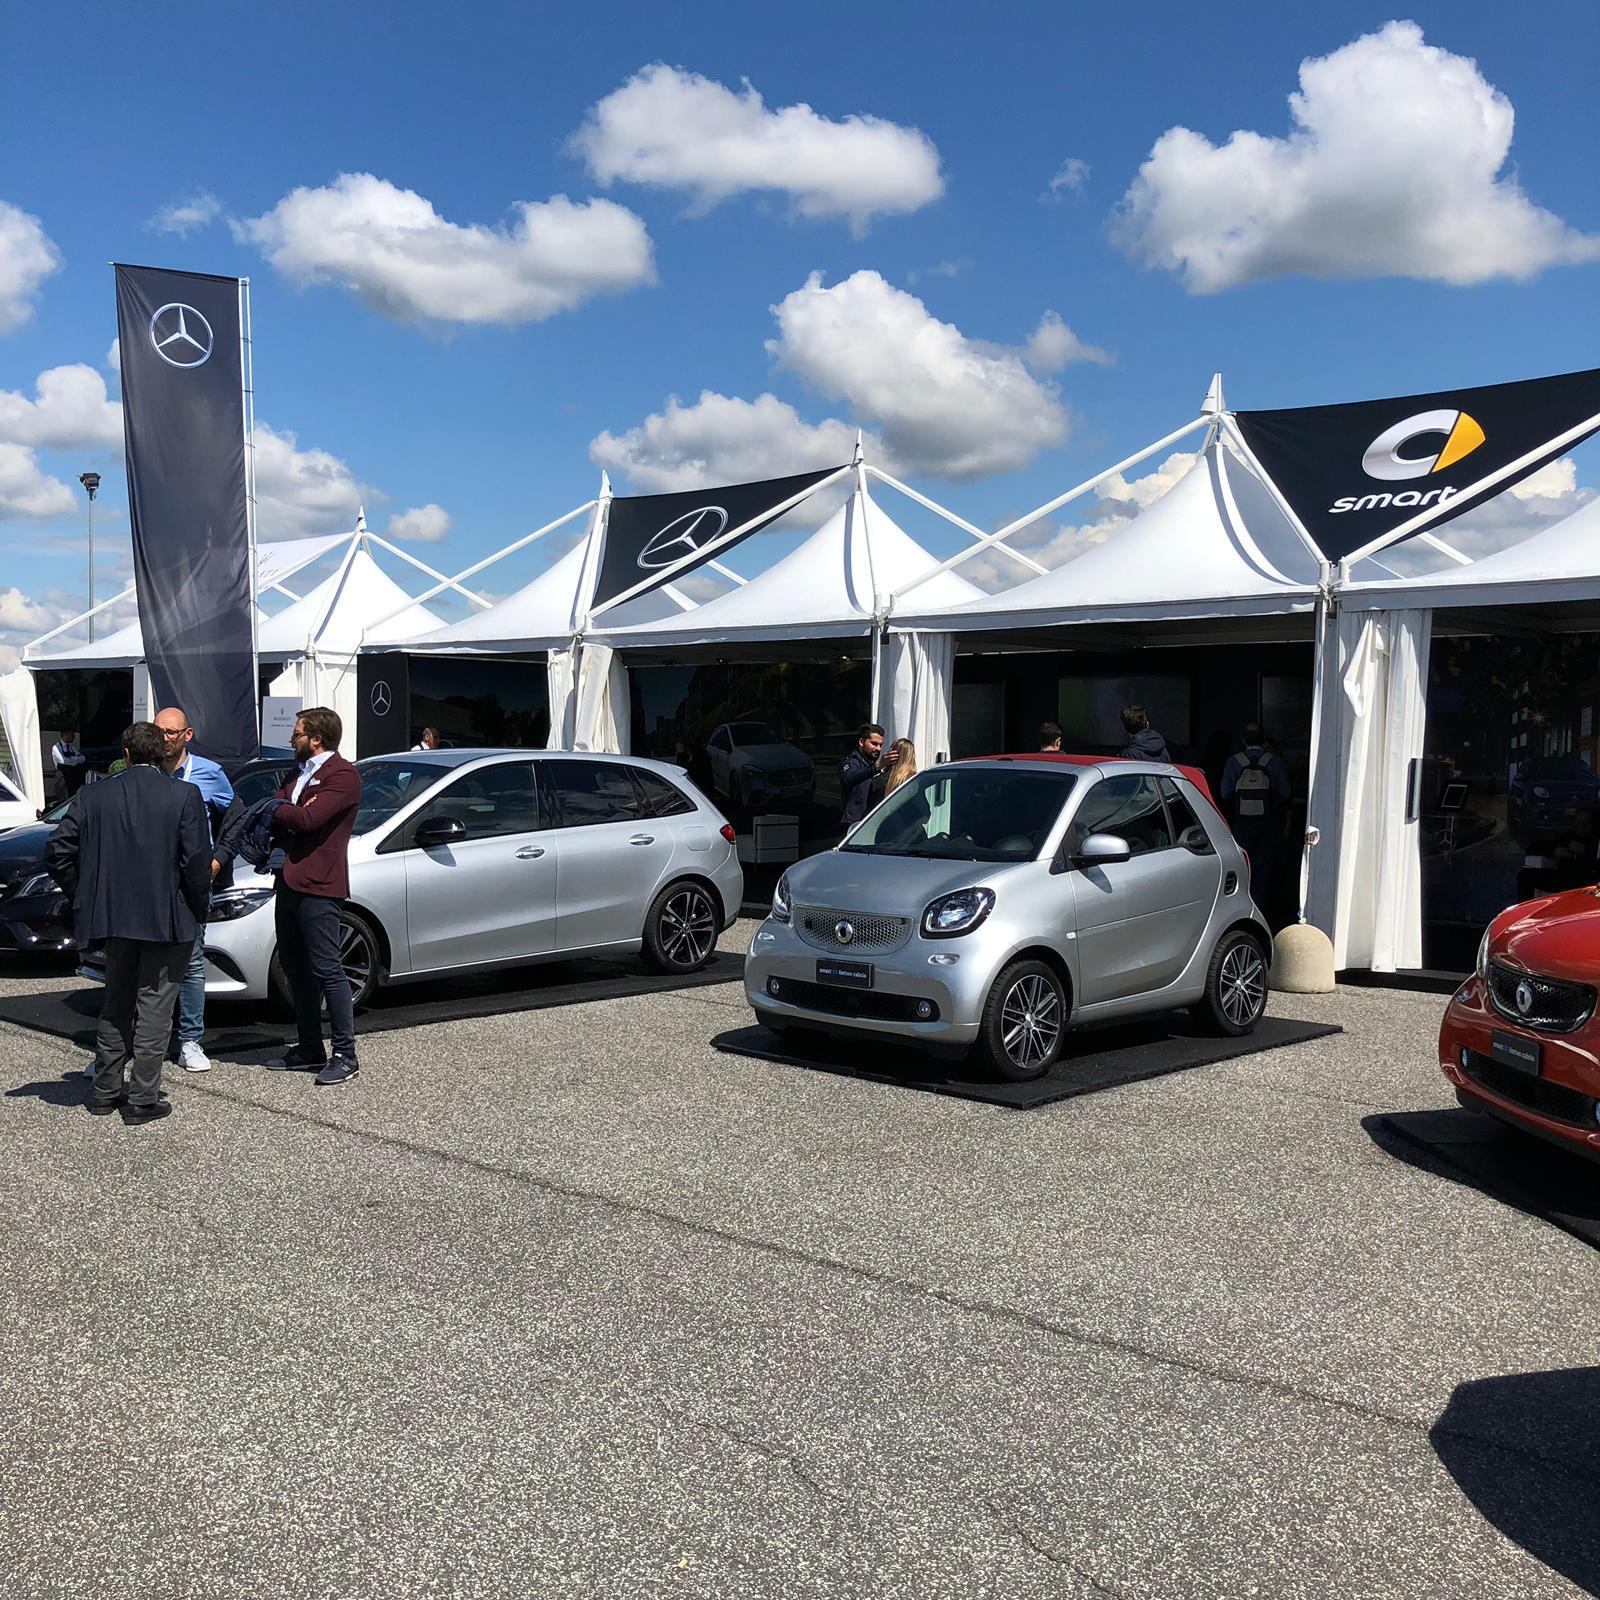 pagoda-smart-fleet-motor-day-2019